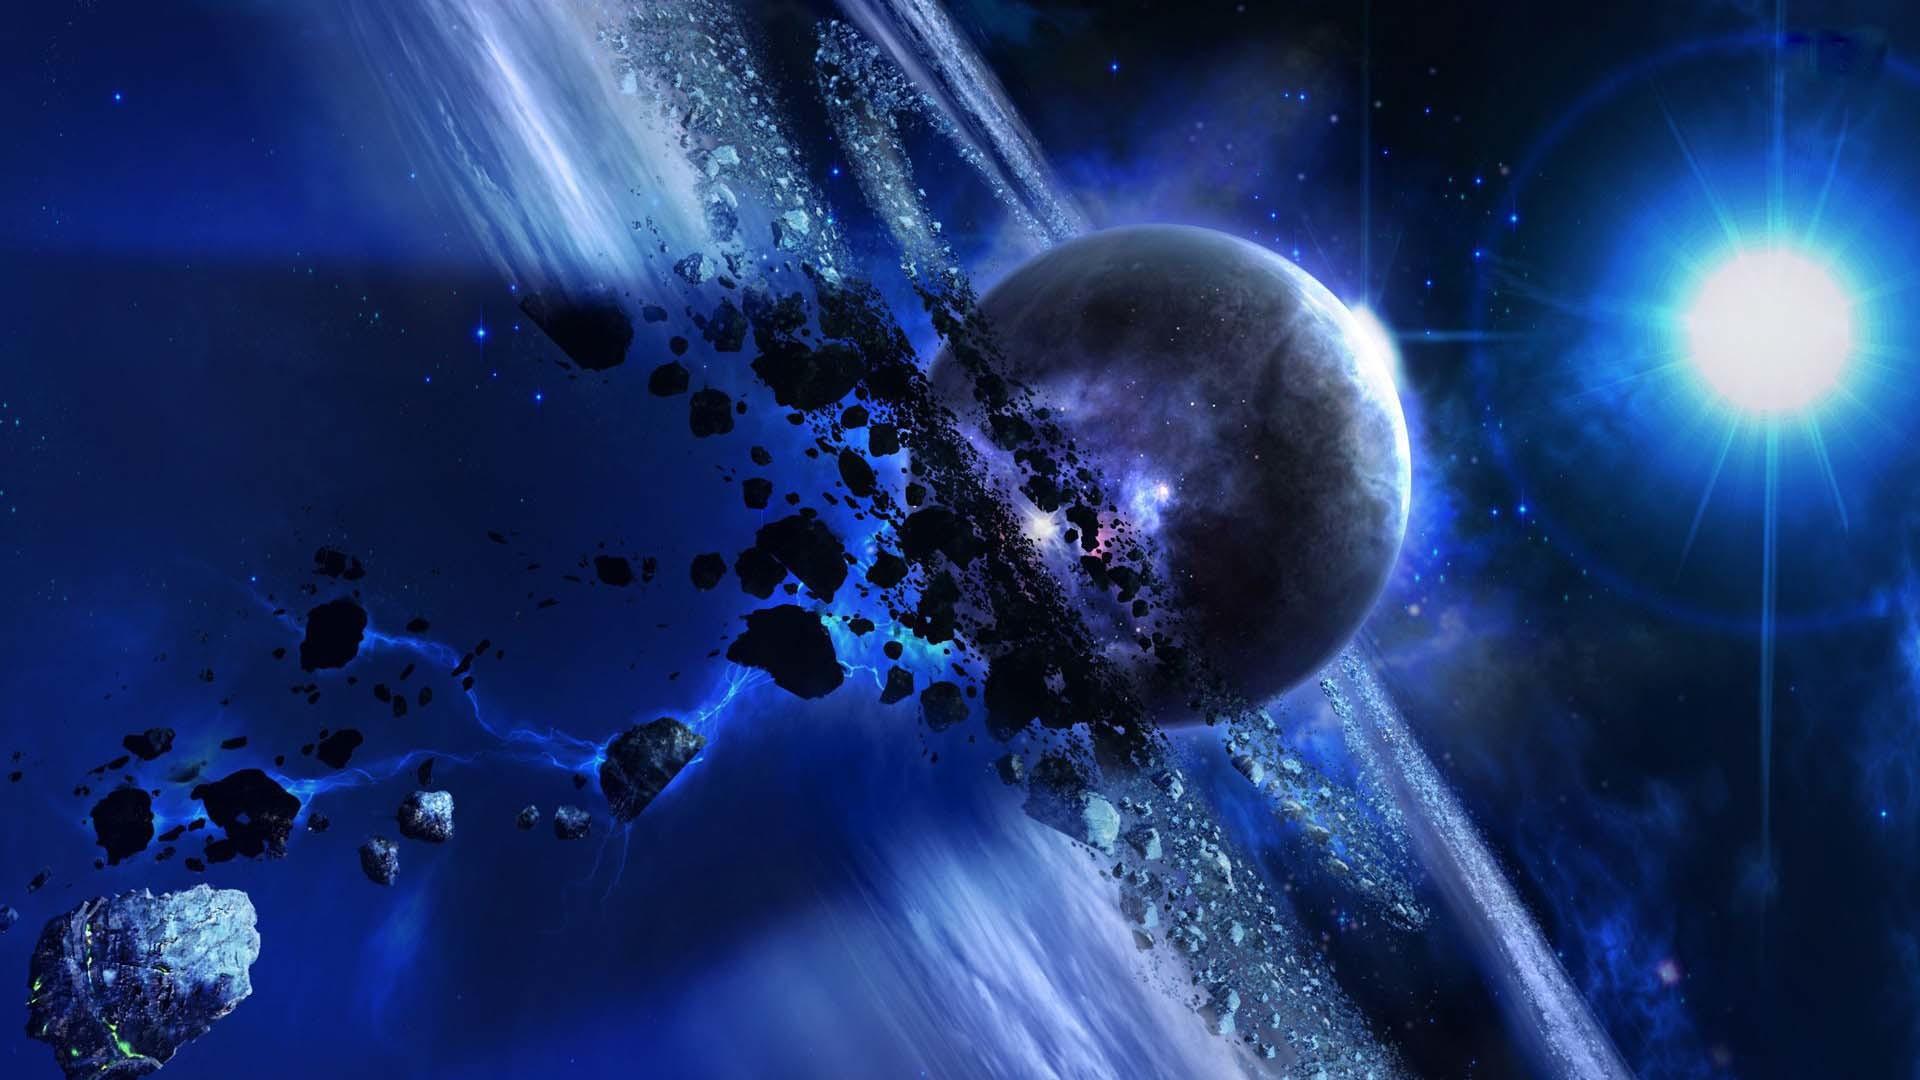 sky universe star planet light satellite orbit HD wallpaper